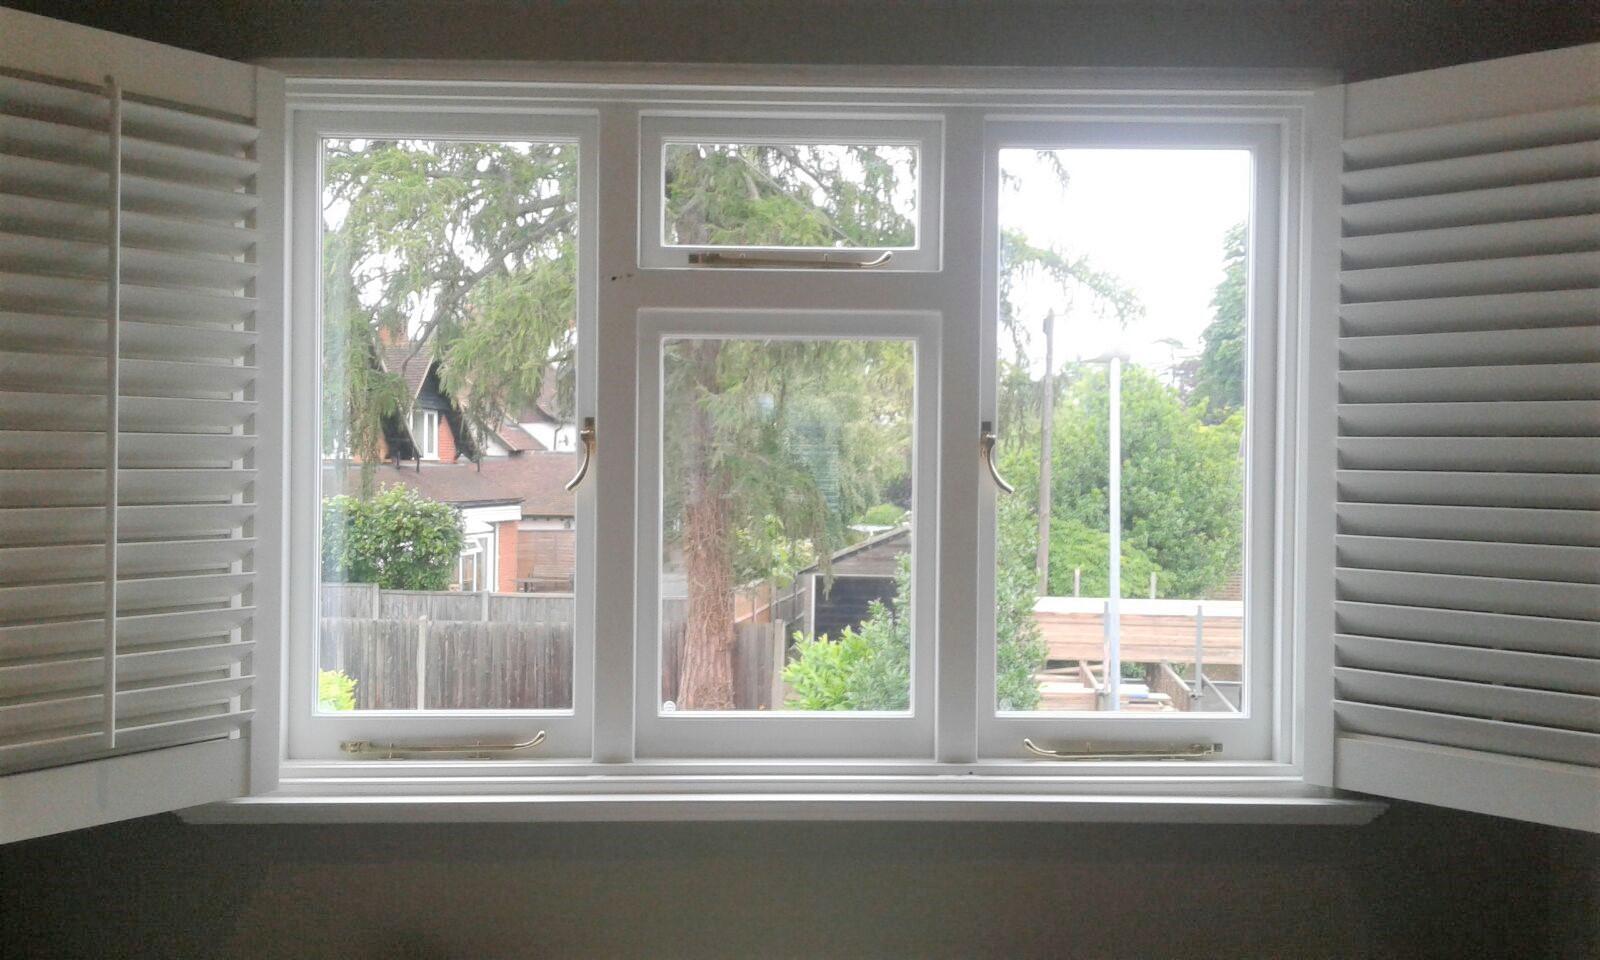 Sash Windows and Shutters